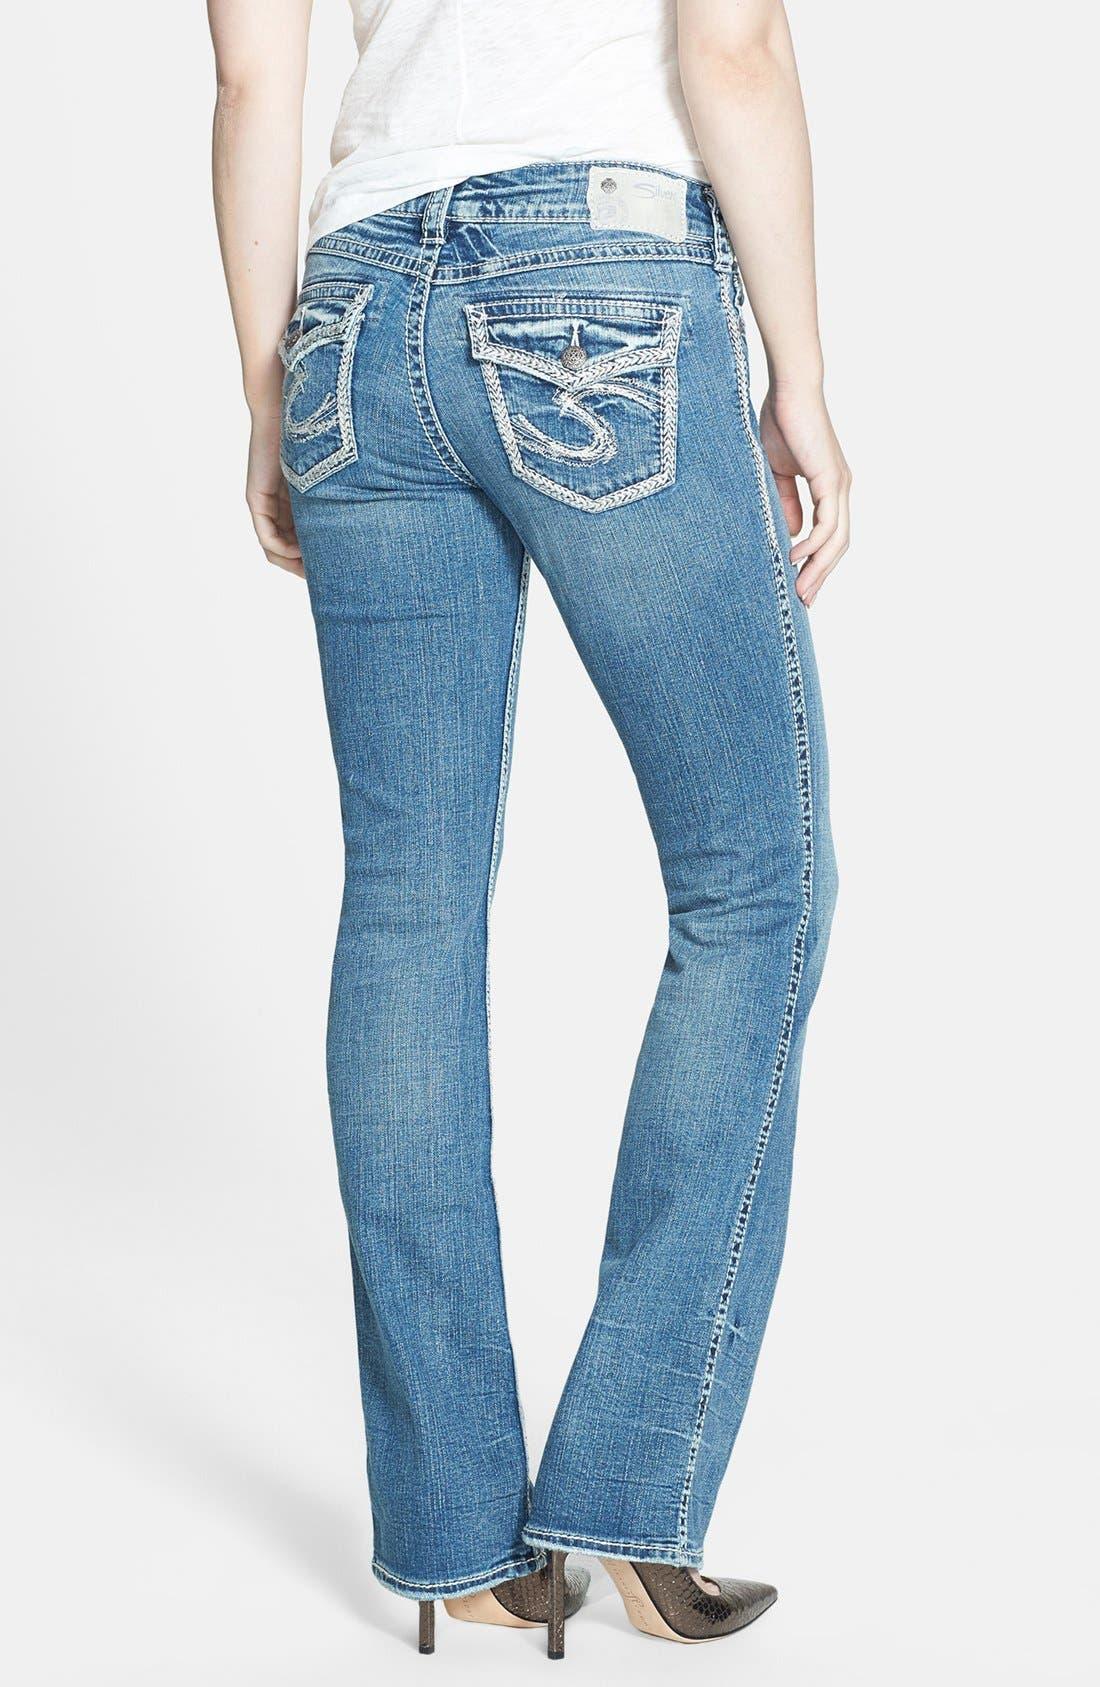 Alternate Image 2  - Silver Jeans Co. 'Suki' Flap Pocket Bootcut Jeans (Indigo)